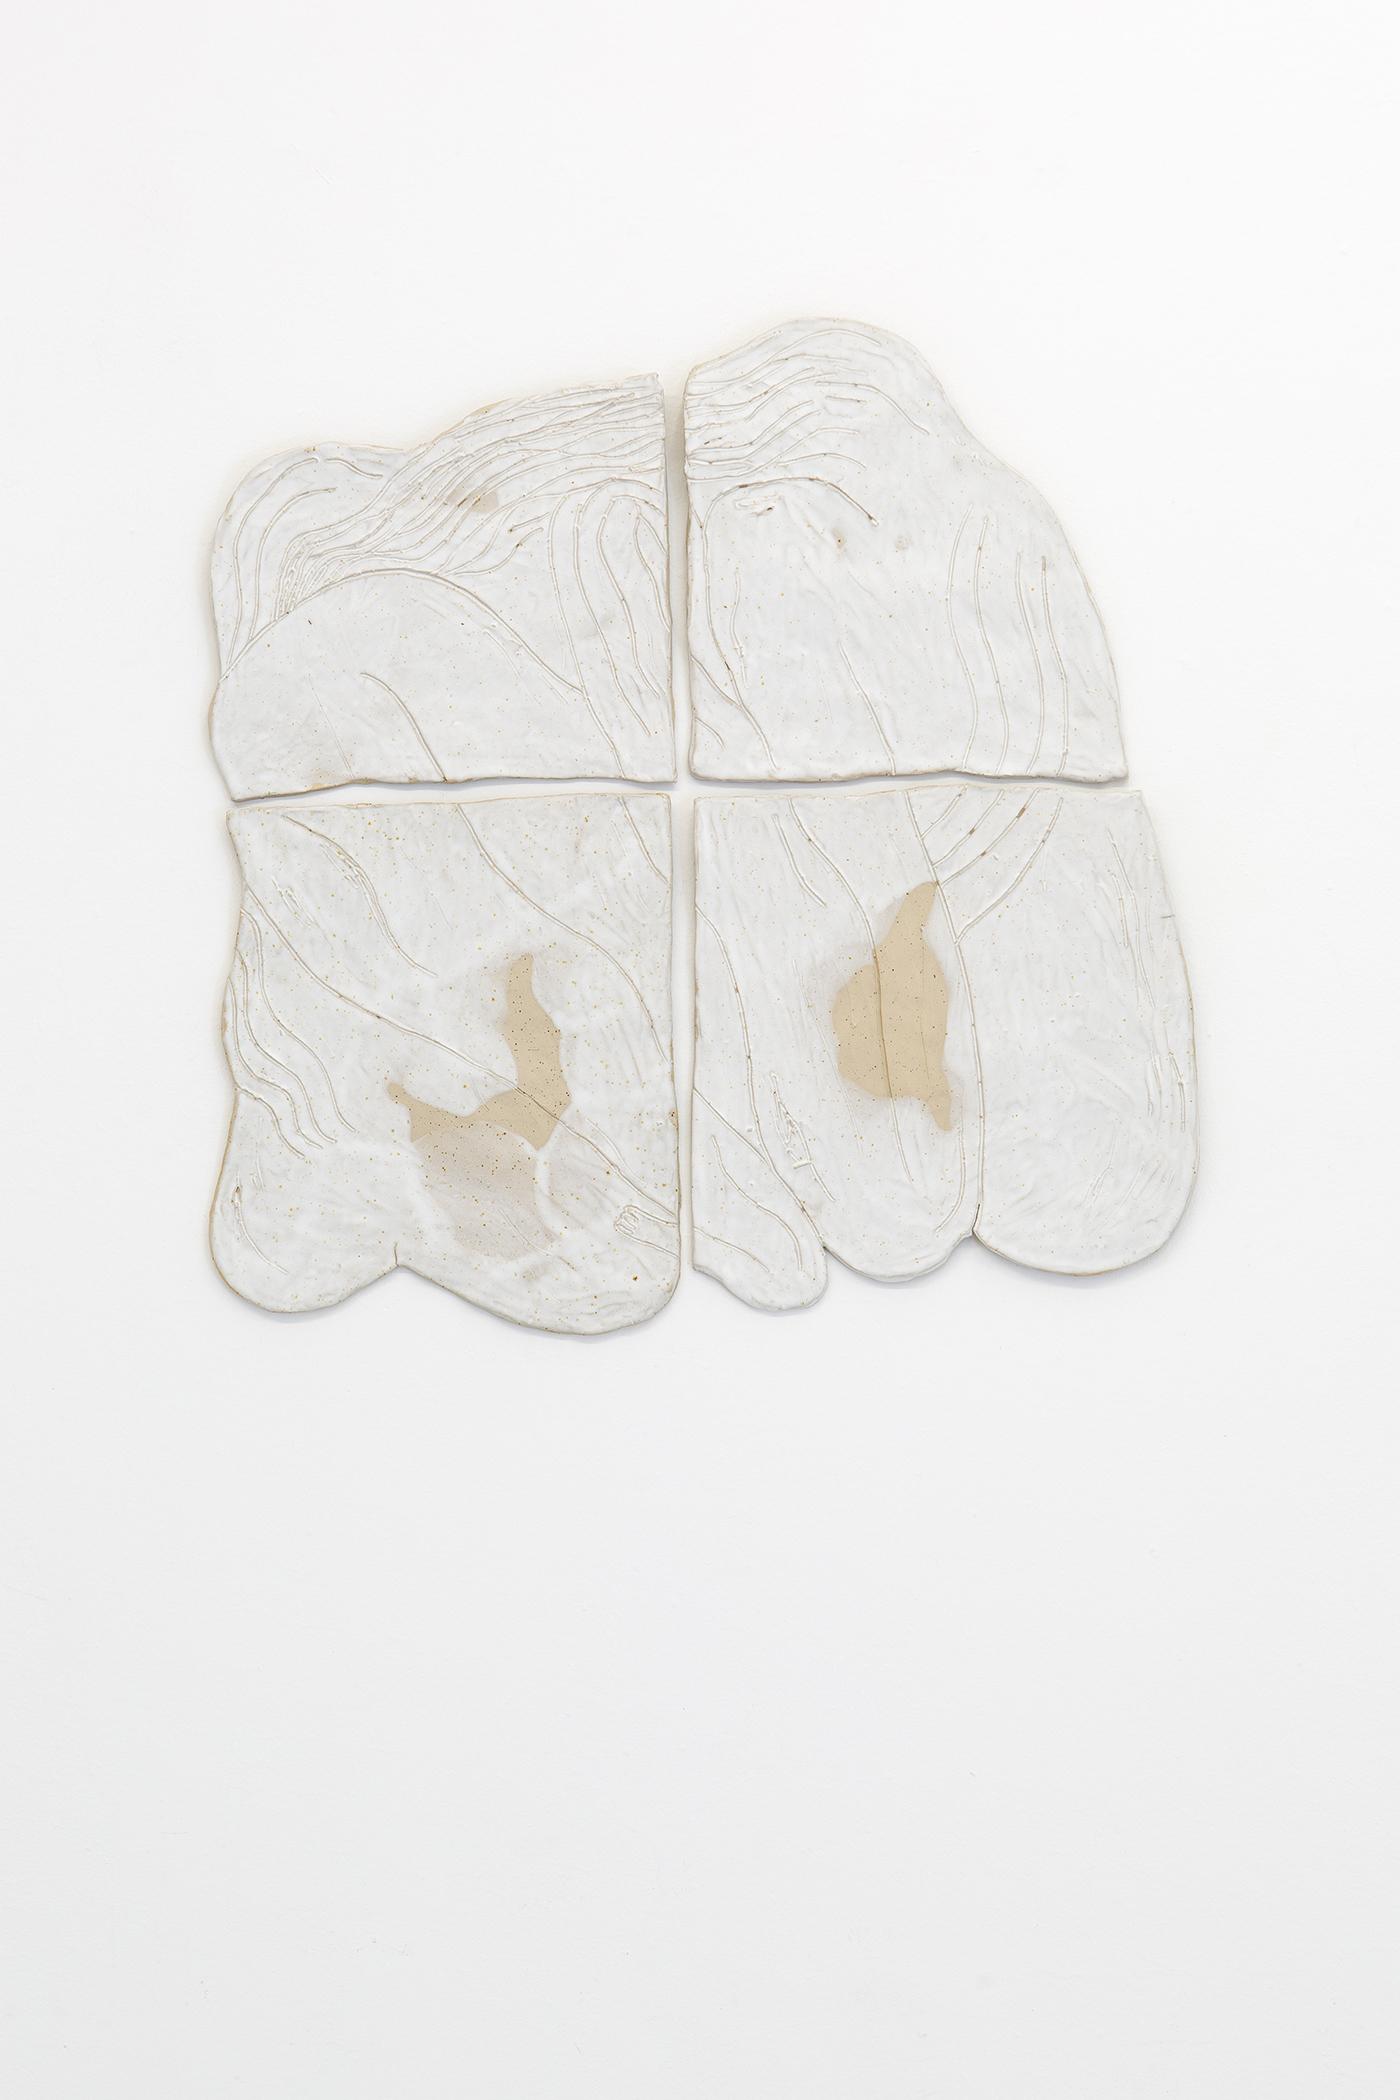 Alina Vergnano,  The Knots,  2019, stoneware, glazed, 60 x 60 cm